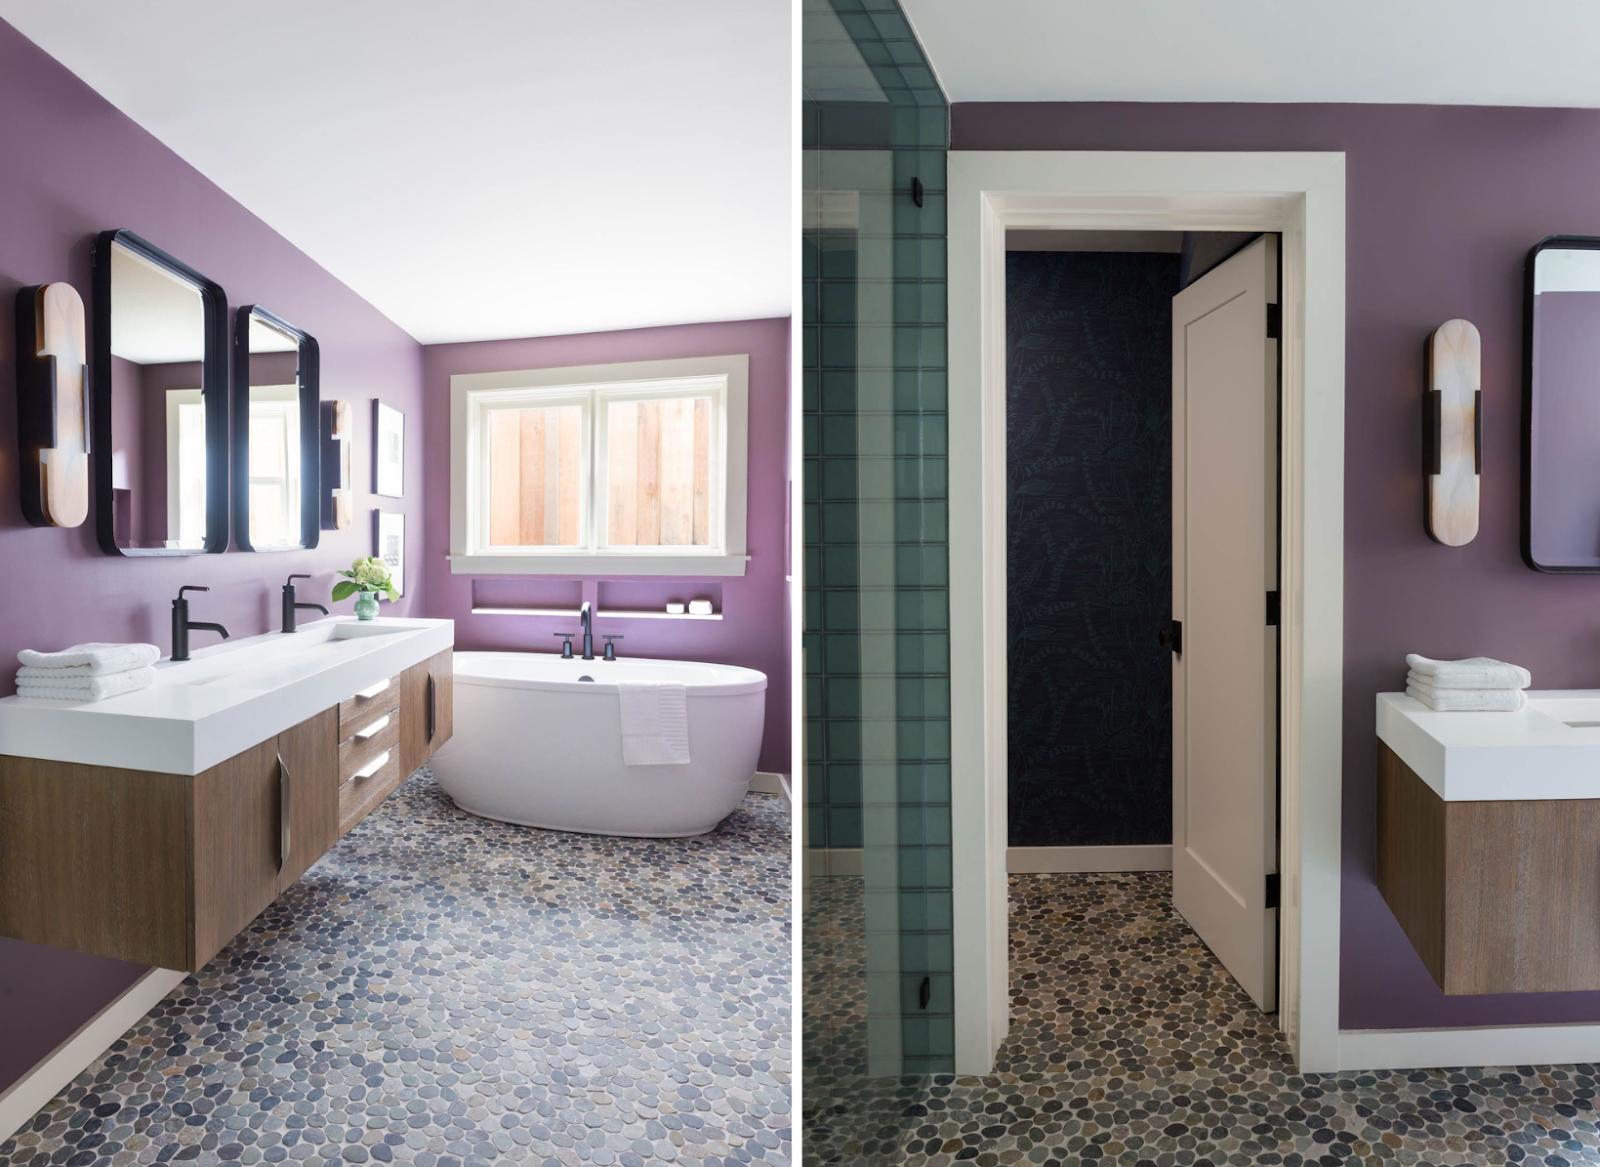 master bathroom river rock dual vanity purple walls free standing tub